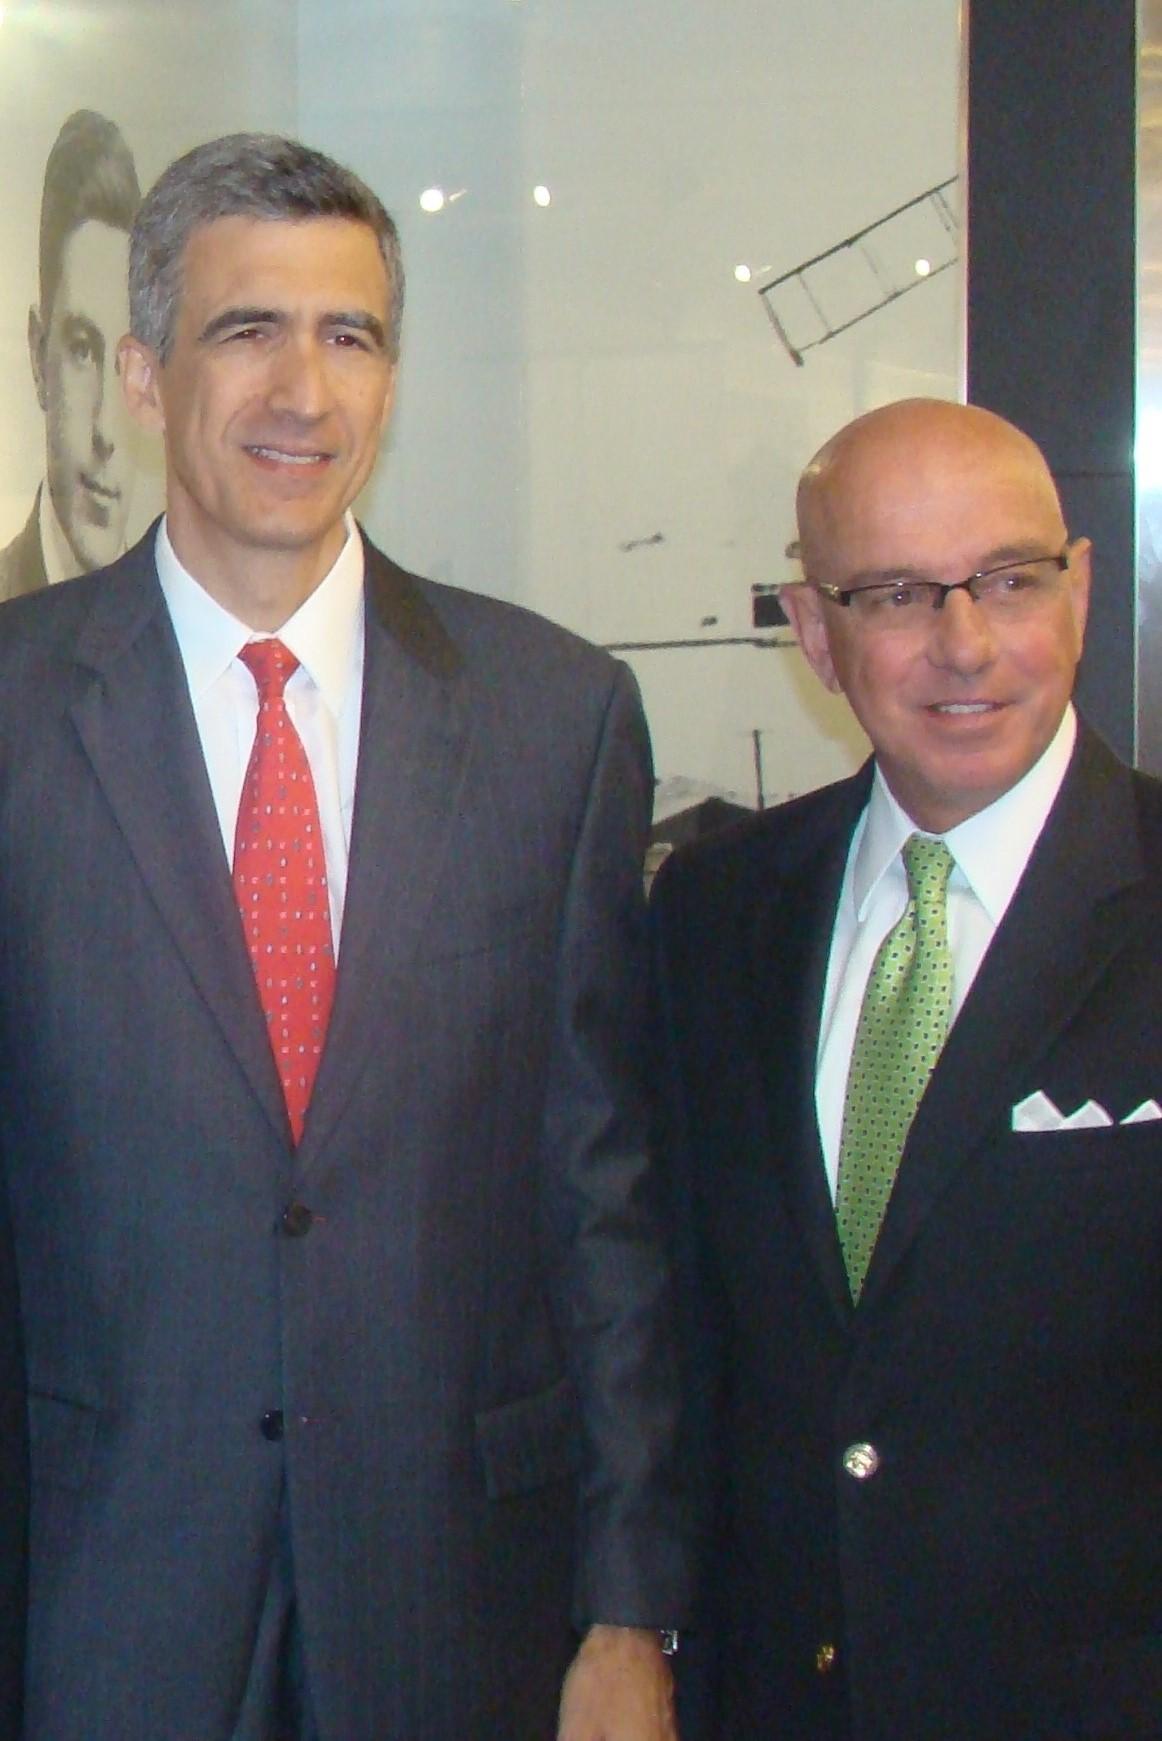 Pedro Hielbron & Joe Lopano - 1, 30 Oct '14 .JPG